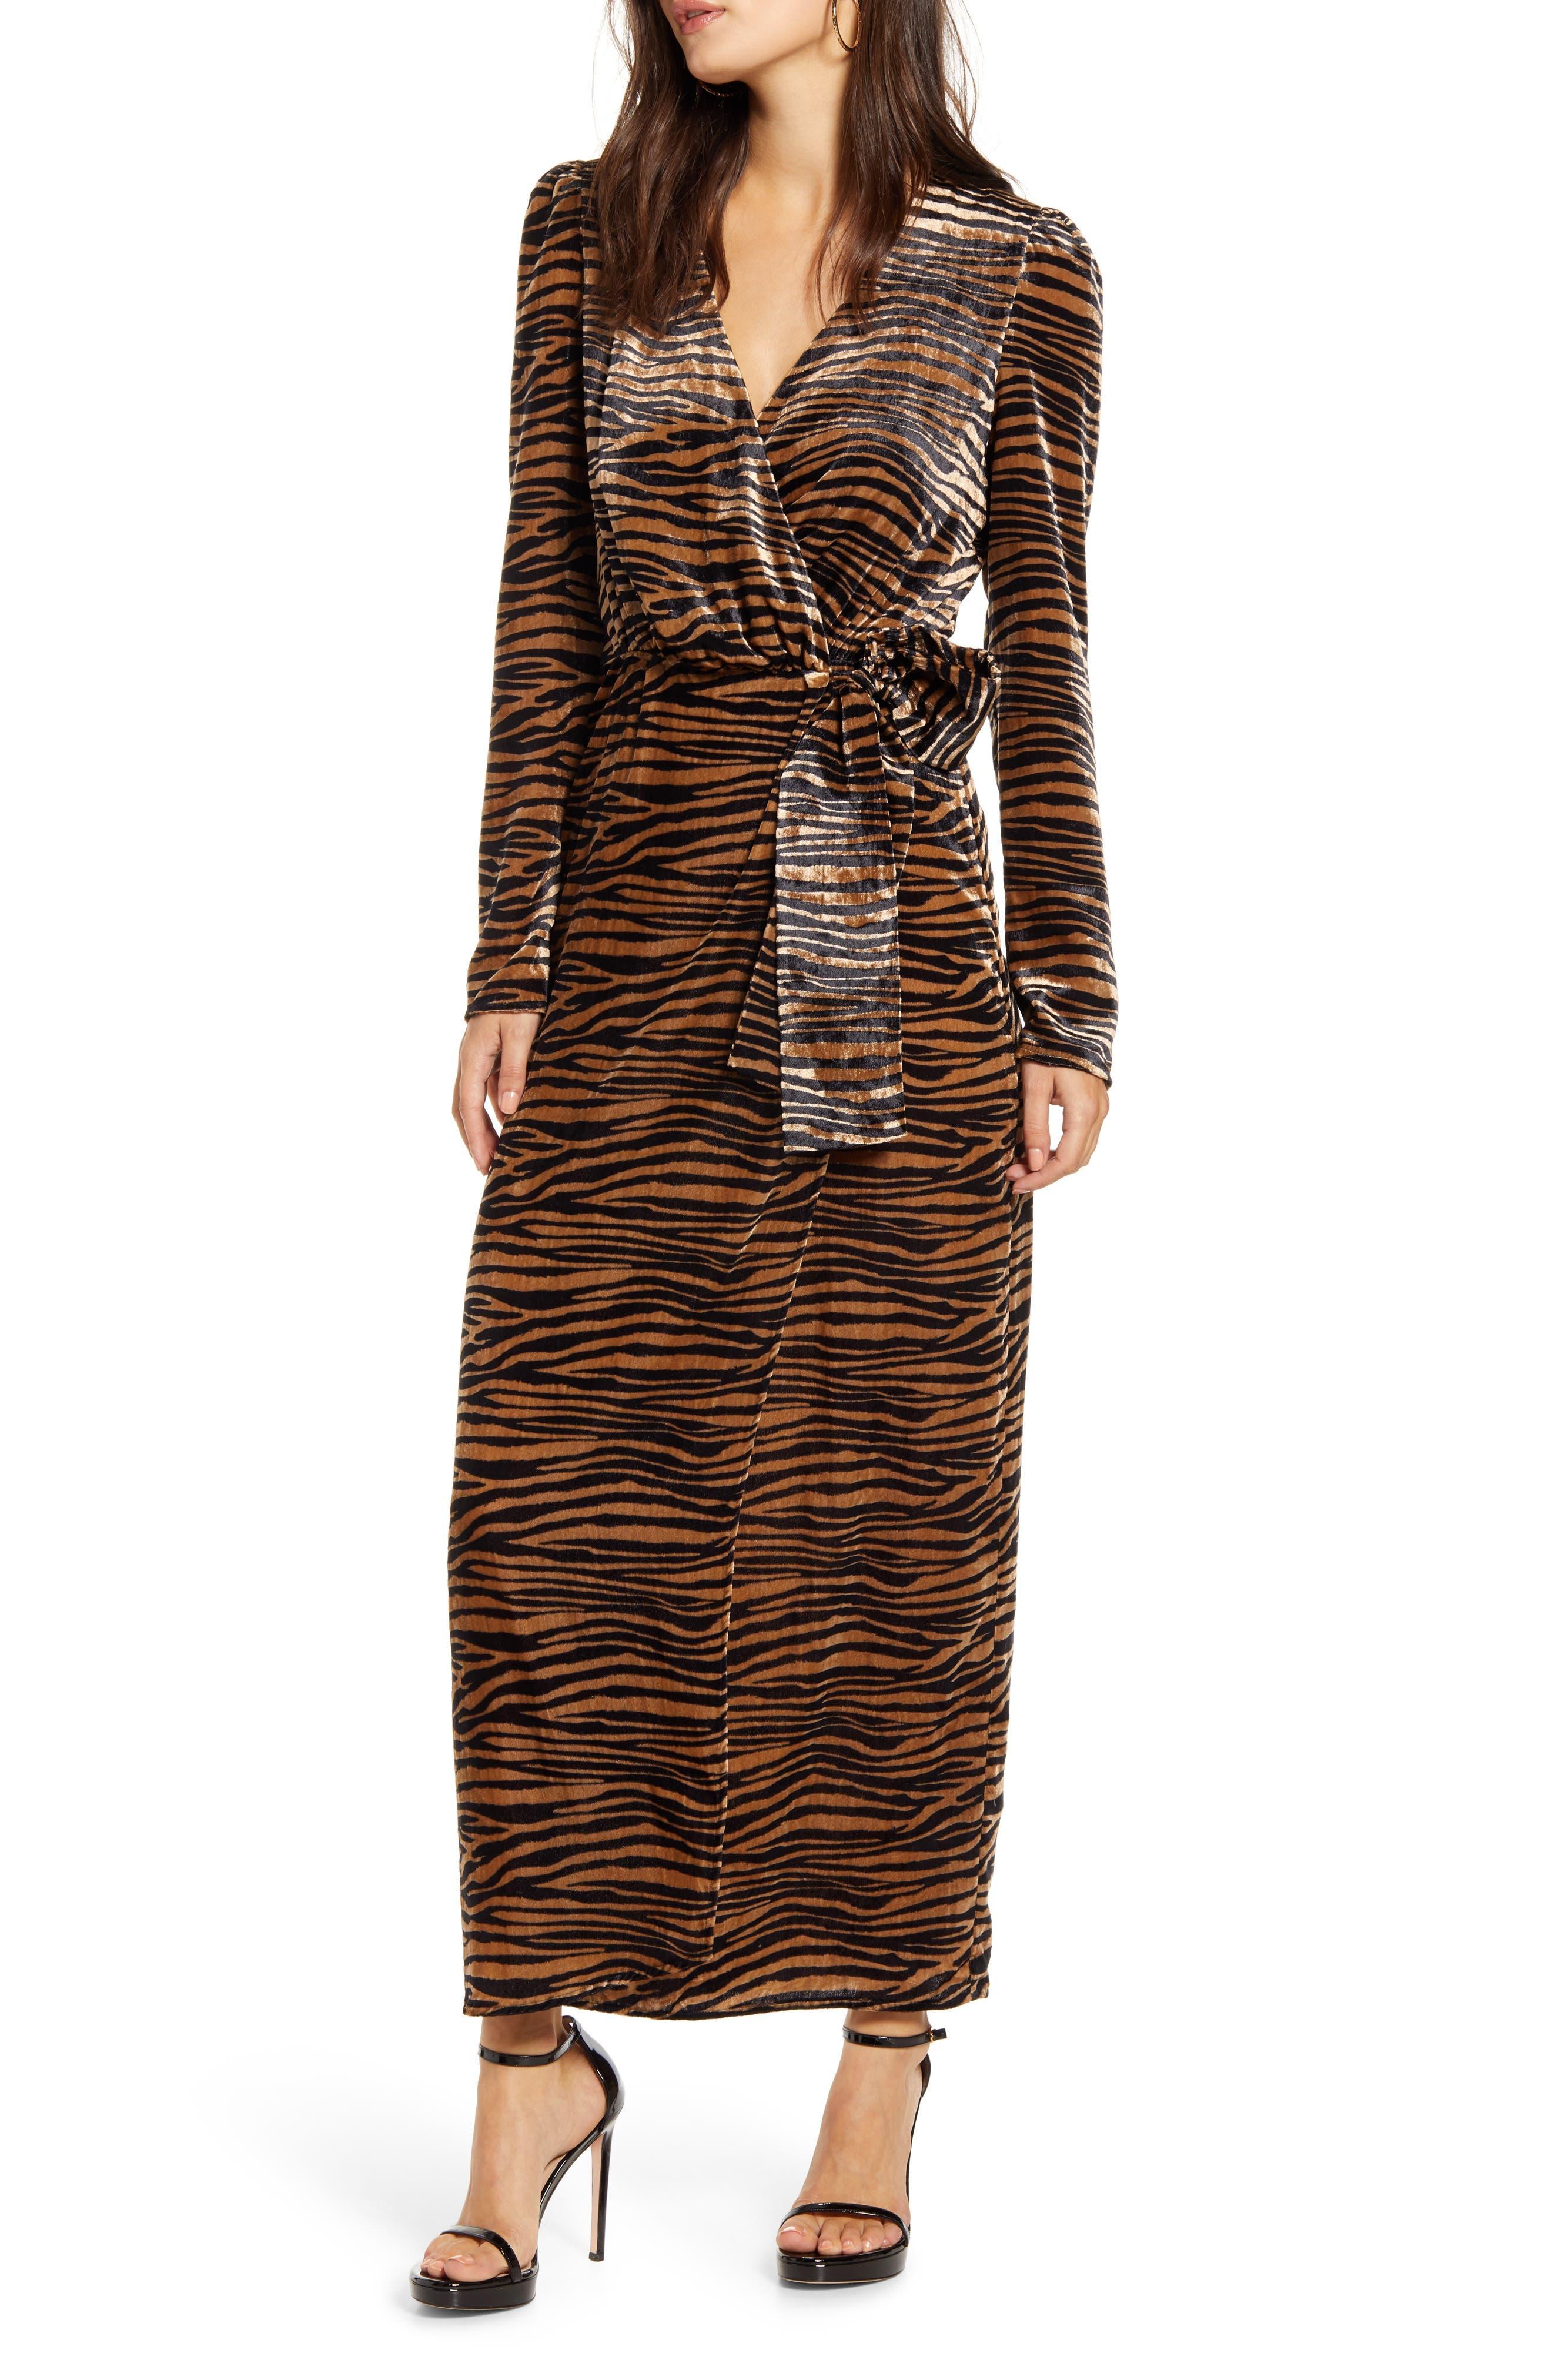 WAYF Arlene Tiger Print Long Sleeve Wrap Velvet Maxi Dress